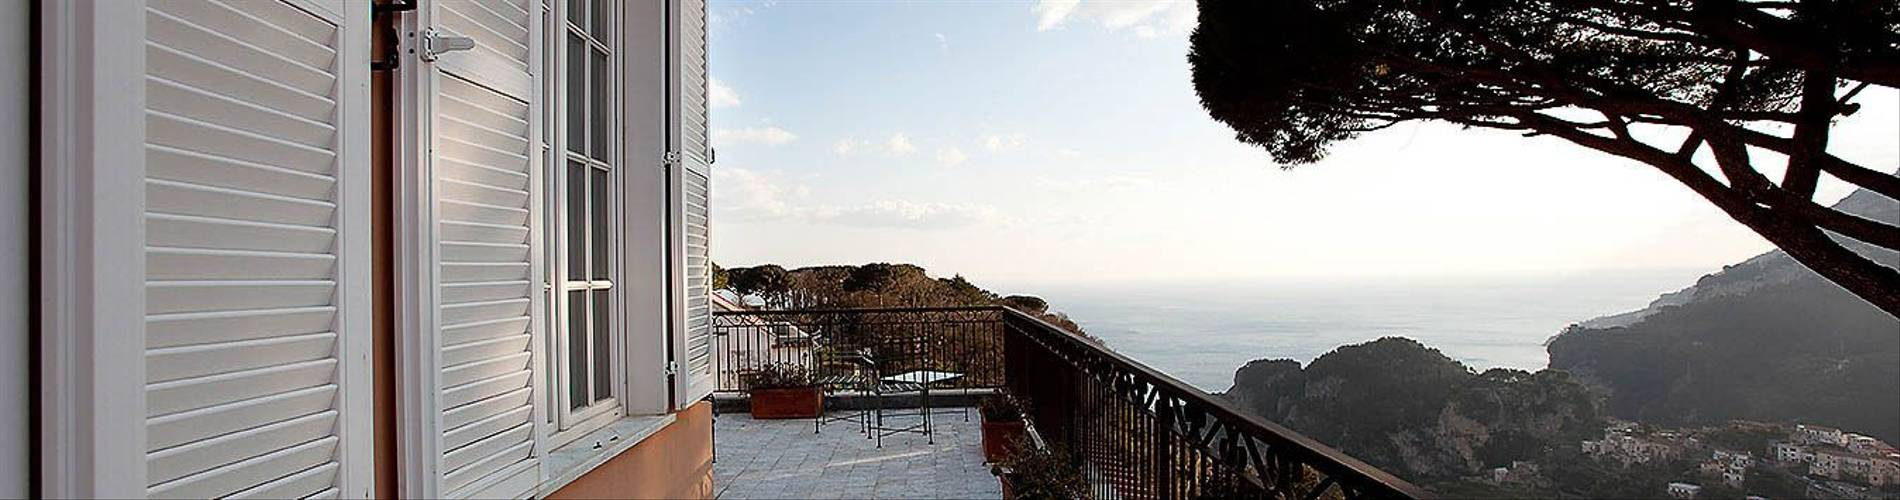 Villa Maria, Amalfi Coast, Italy (9).jpg